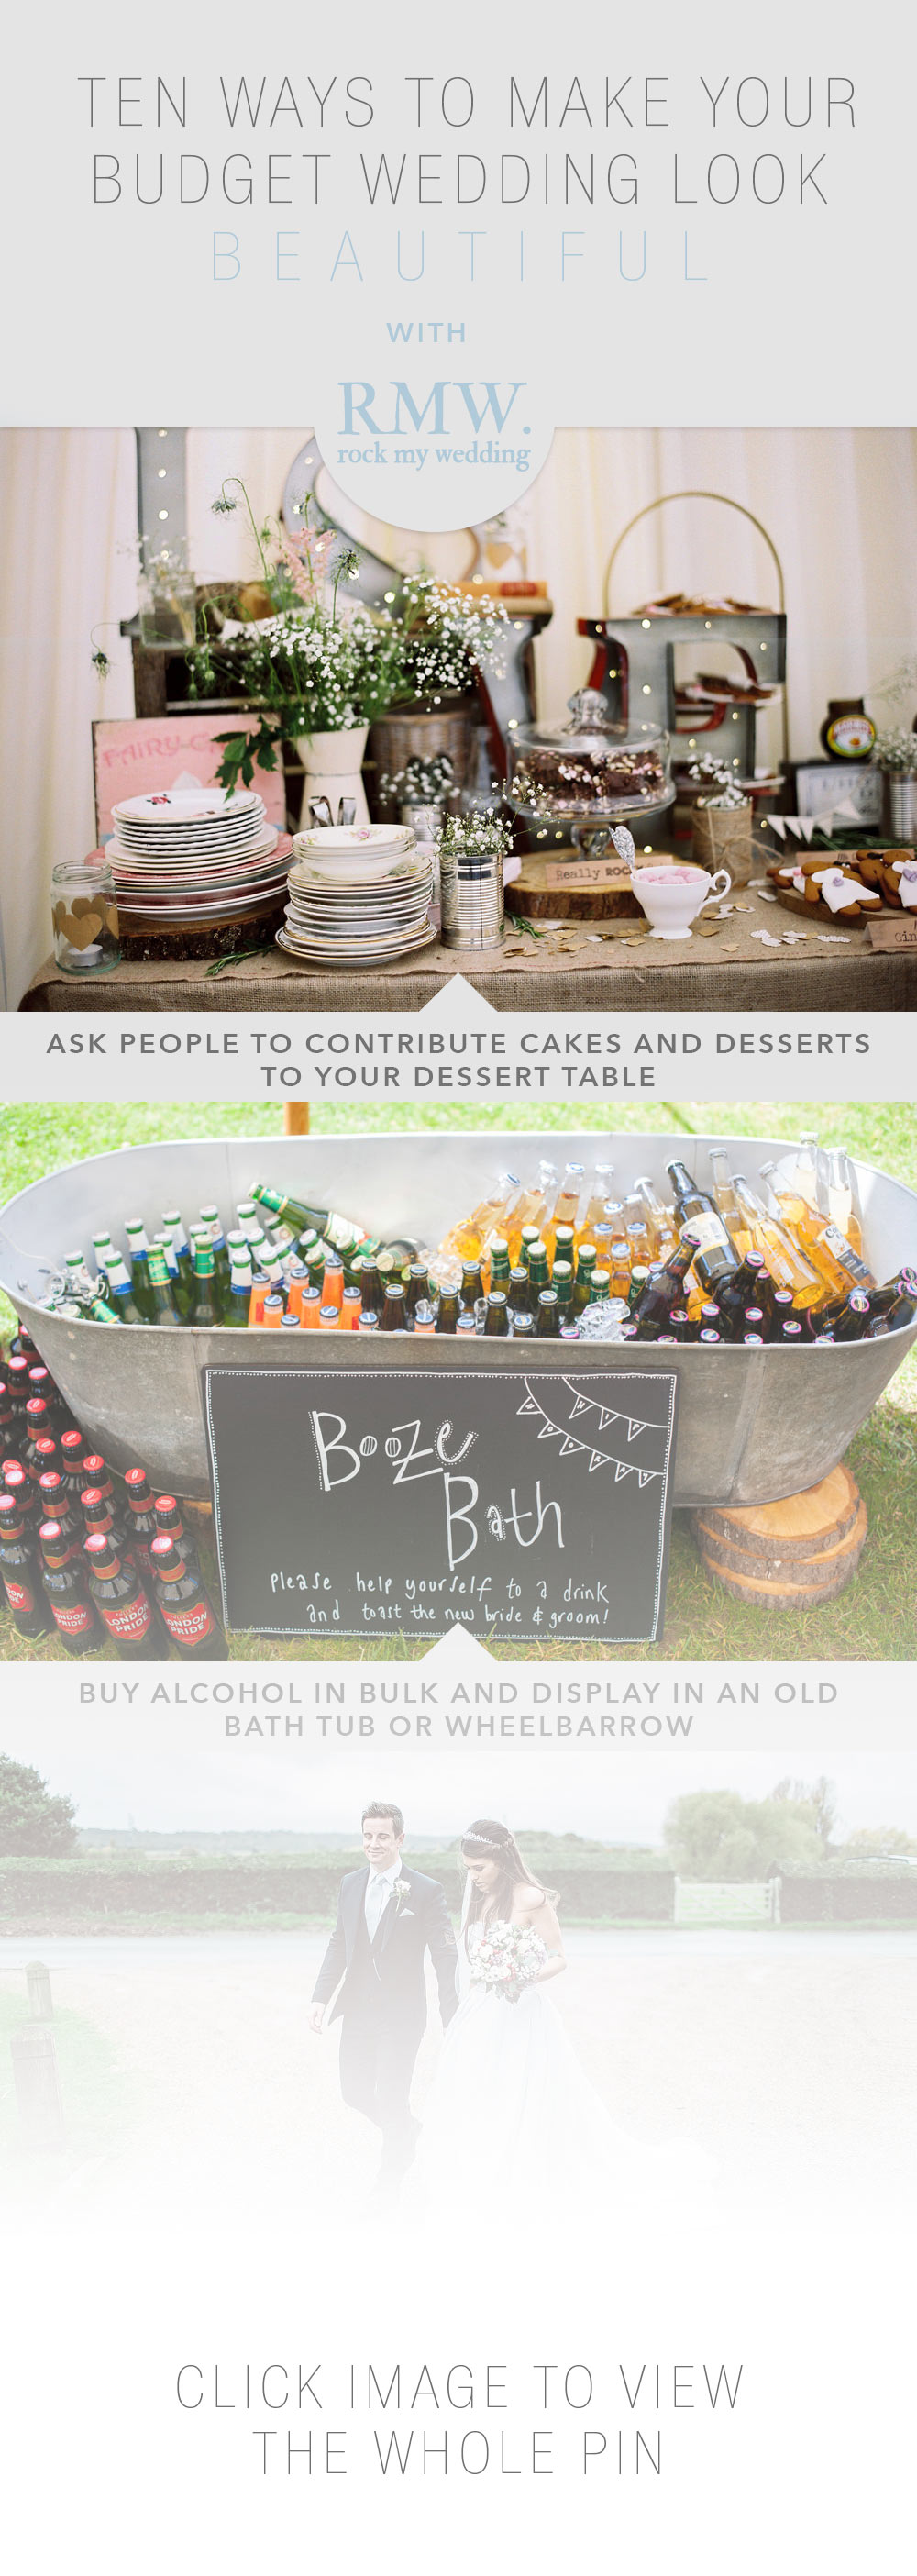 10 ways to make your budget wedding look beautiful